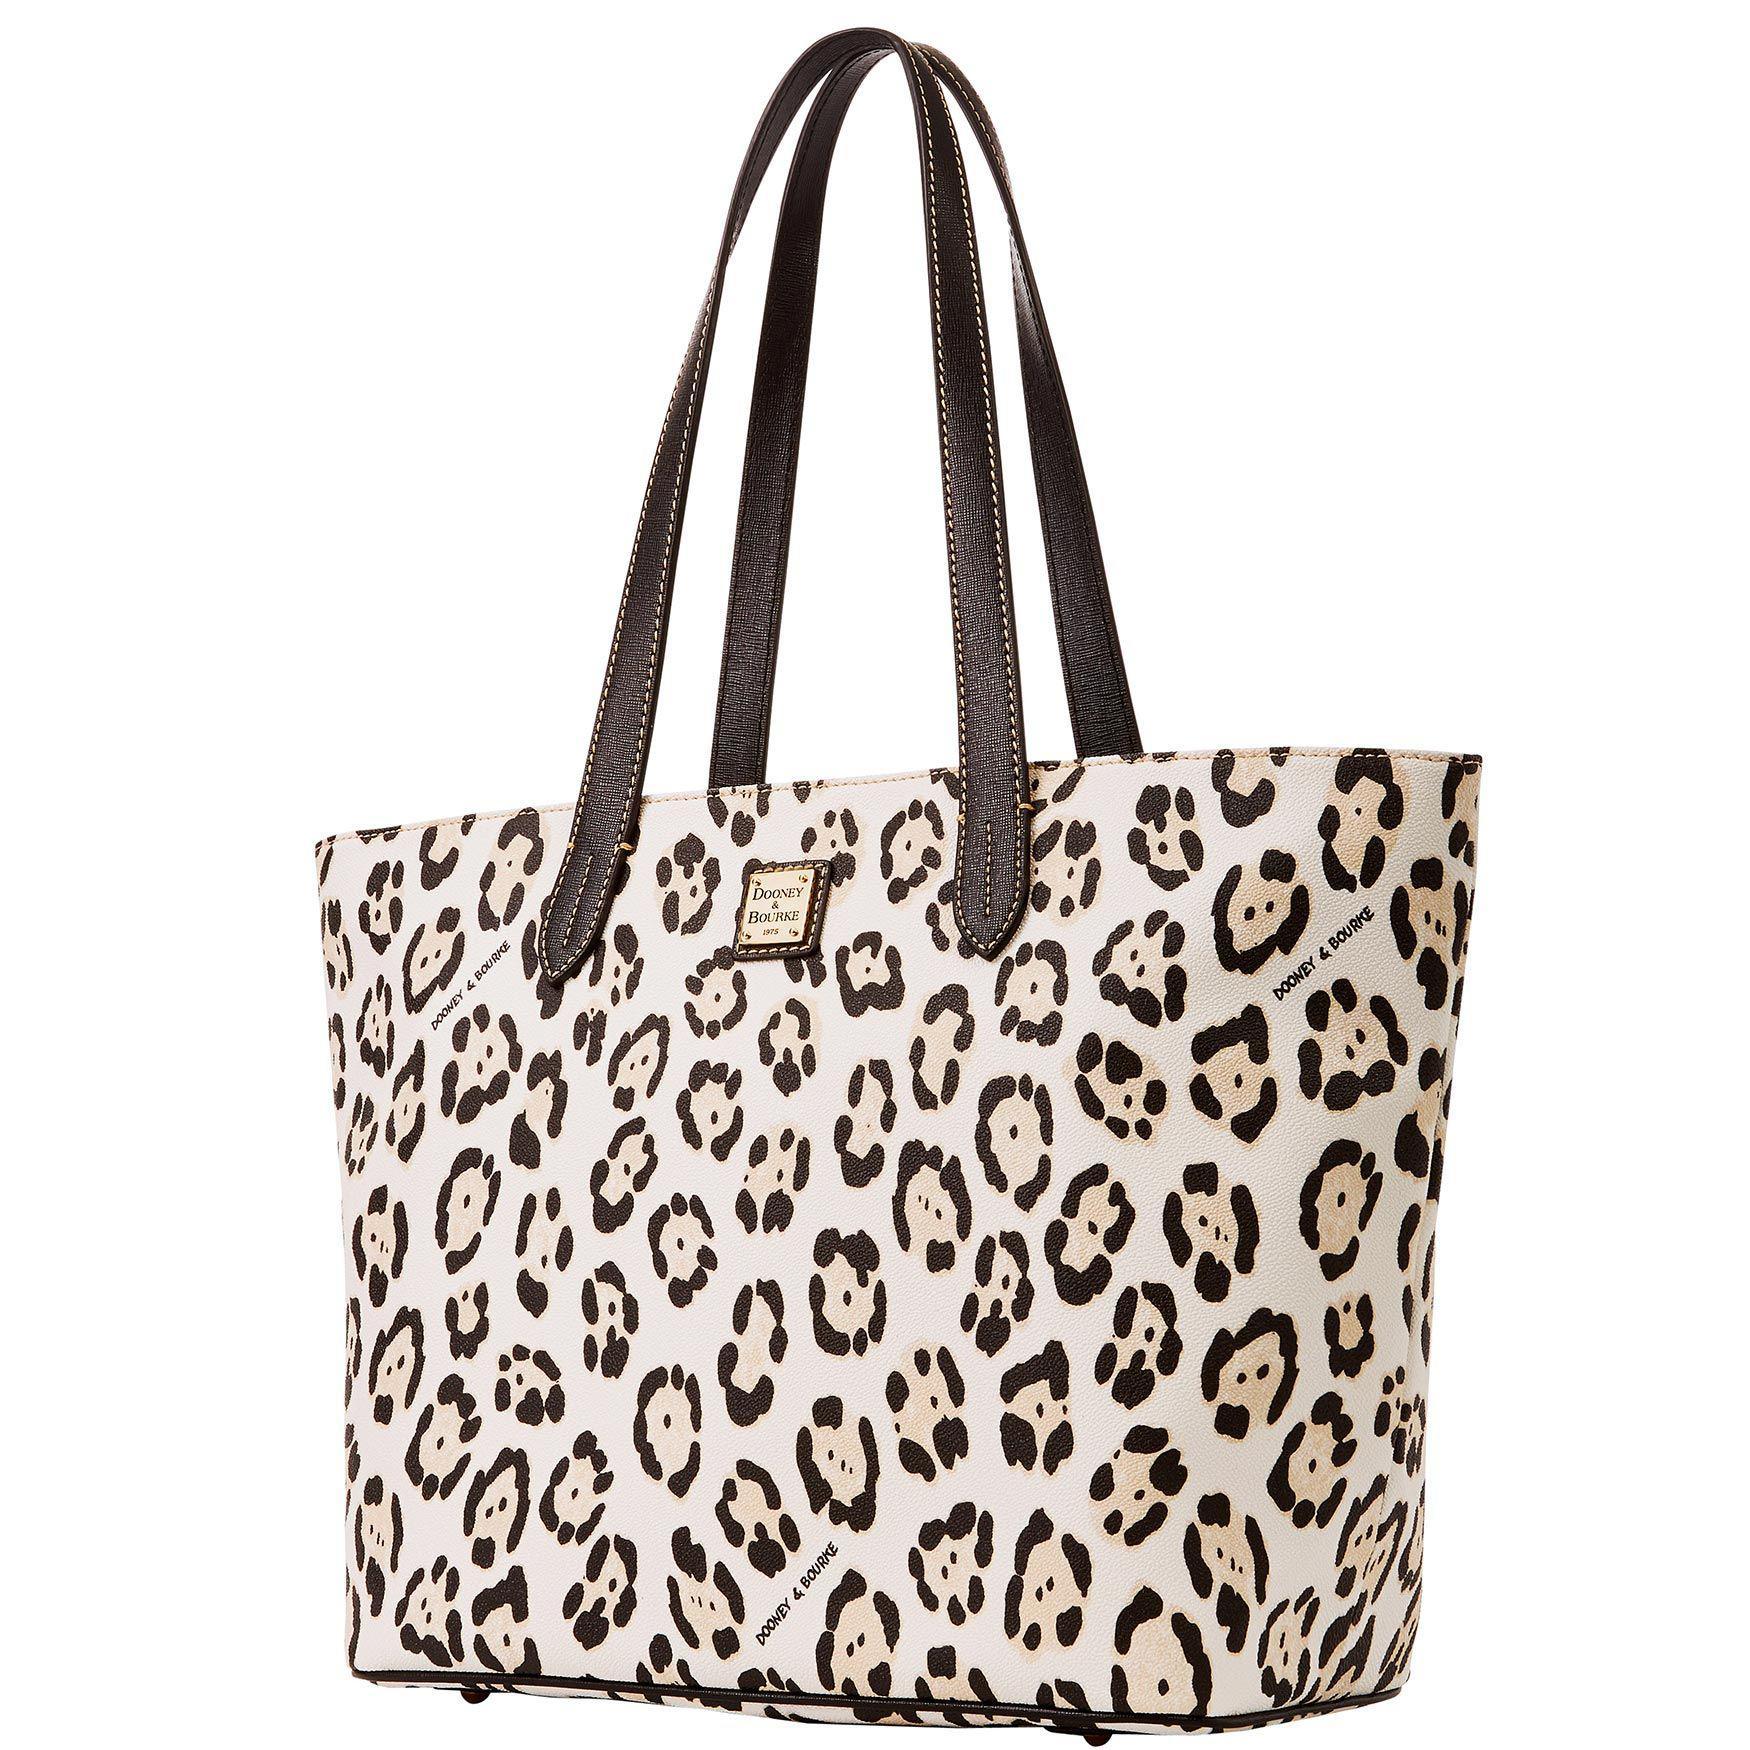 Dooney Bourke Pebble Leather Crossbody Handbag Trixie Page 1